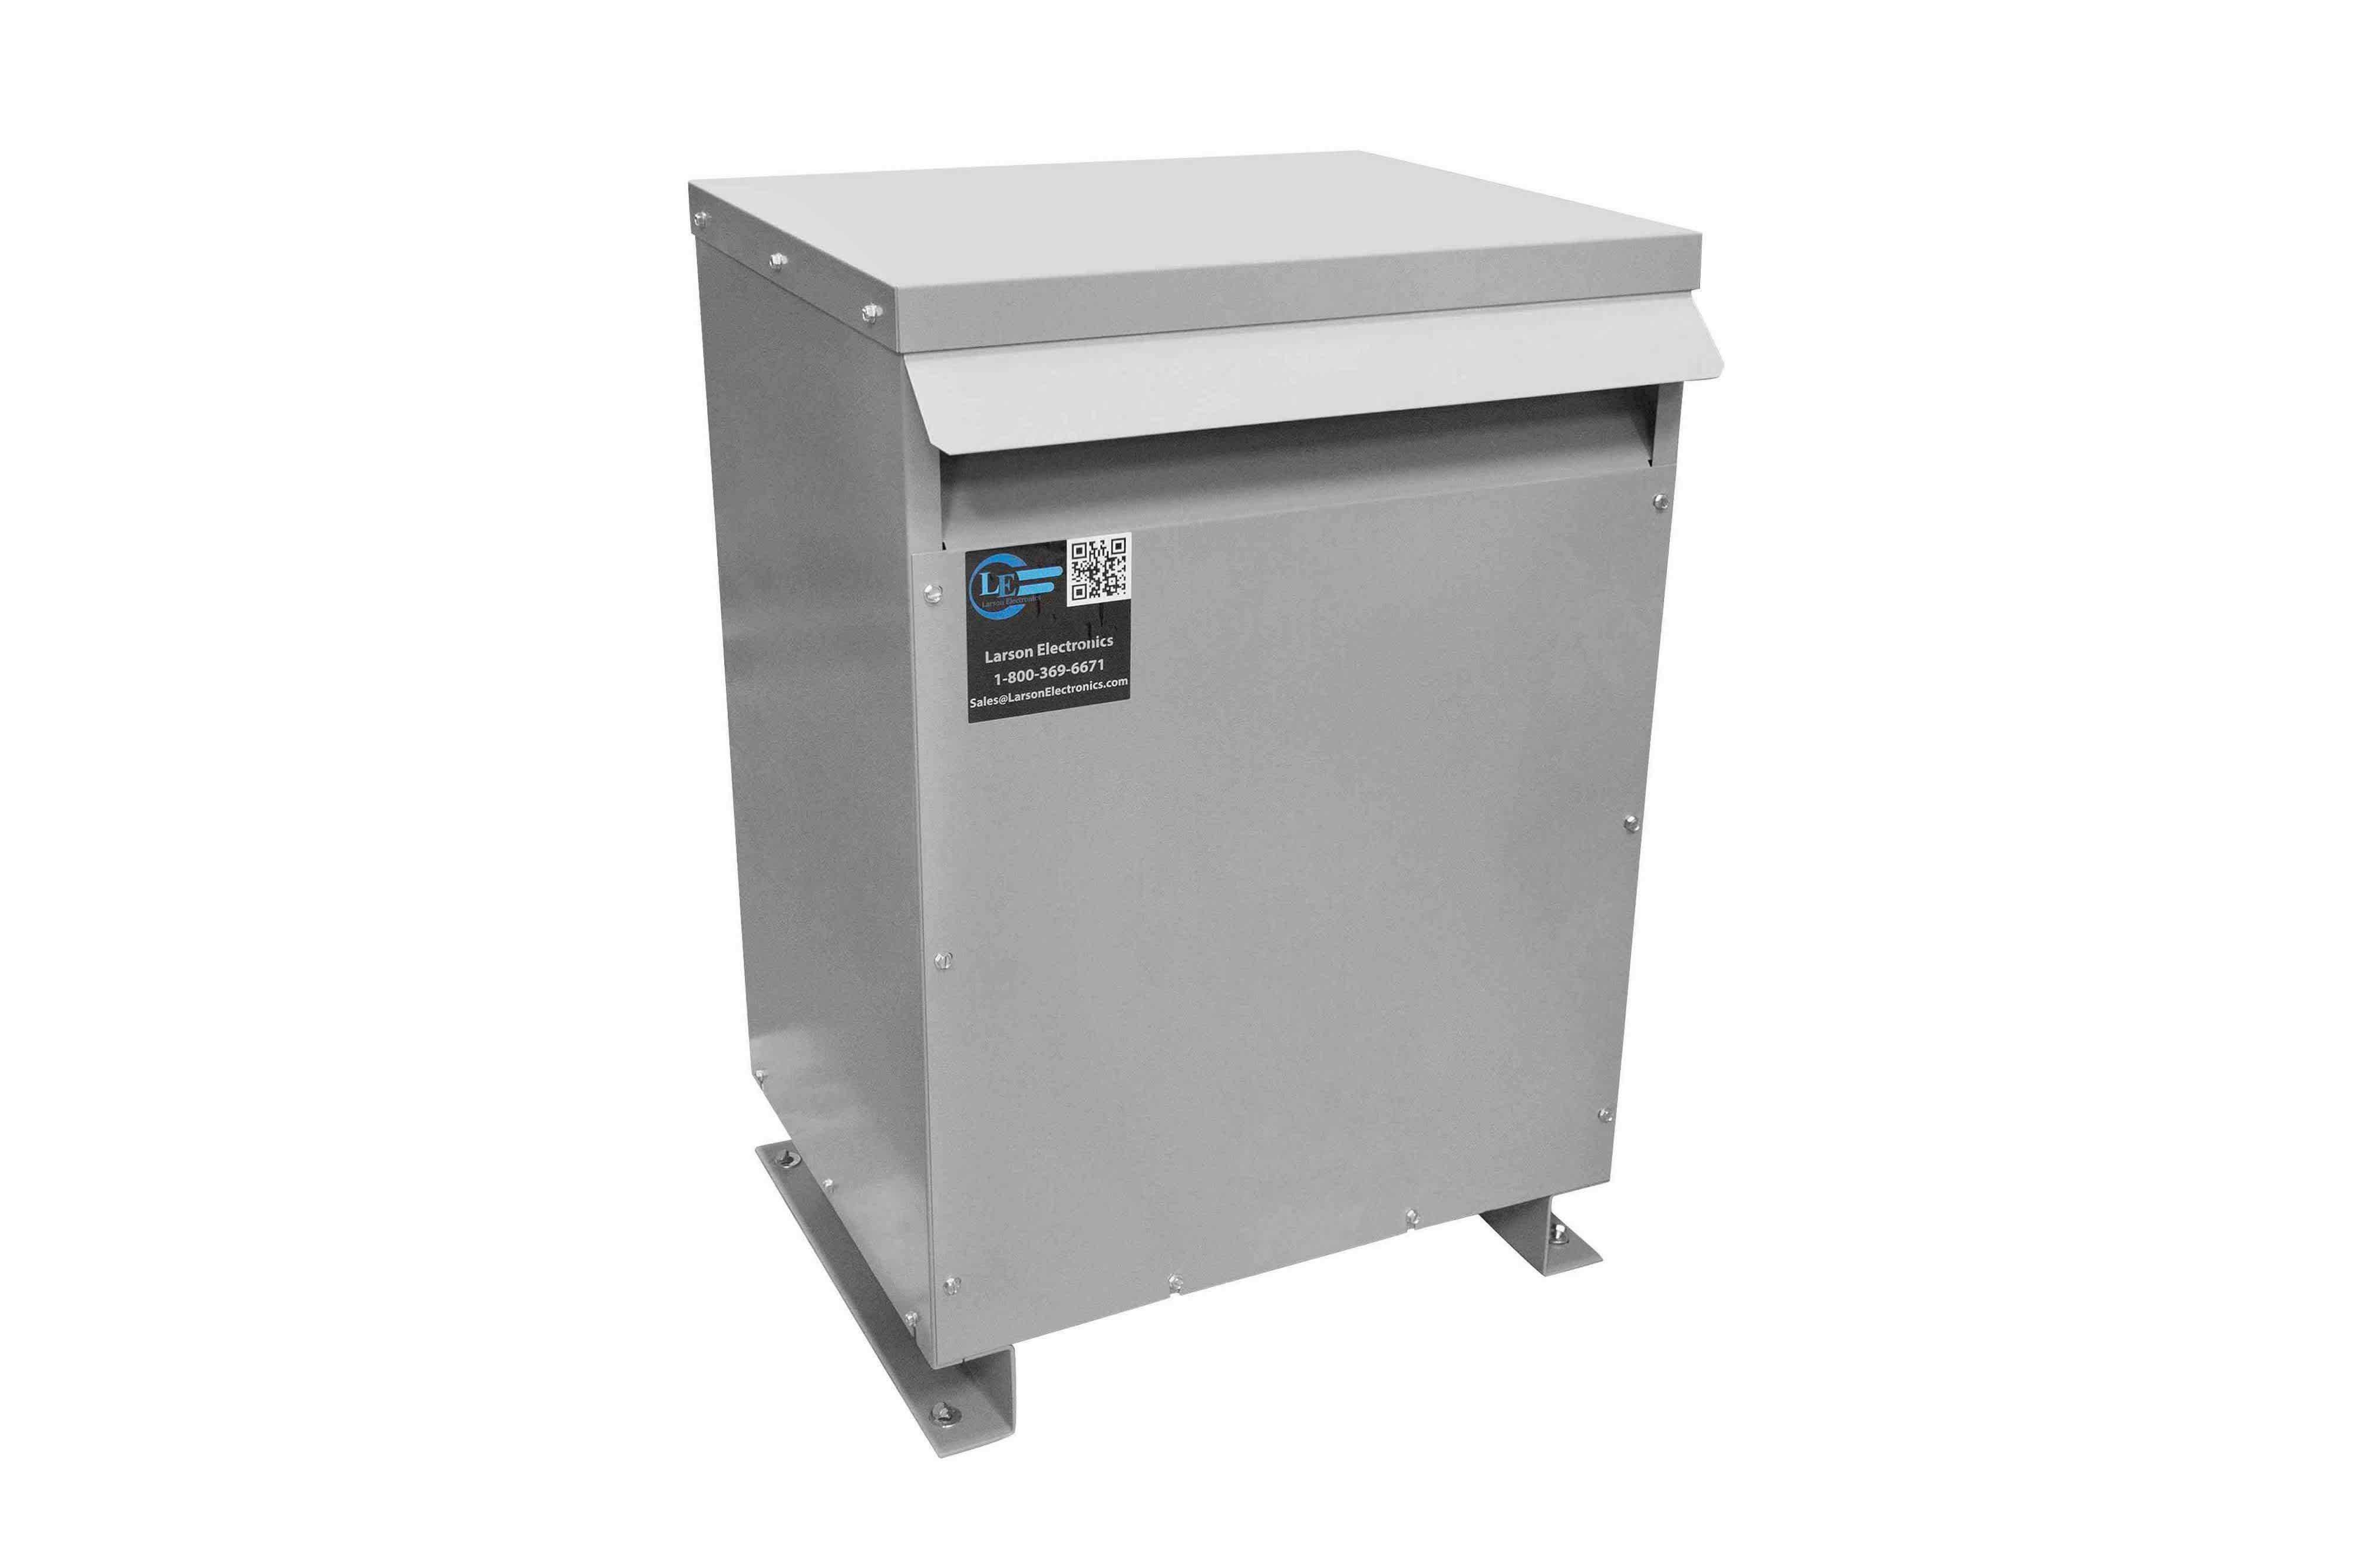 167 kVA 3PH DOE Transformer, 600V Delta Primary, 480Y/277 Wye-N Secondary, N3R, Ventilated, 60 Hz